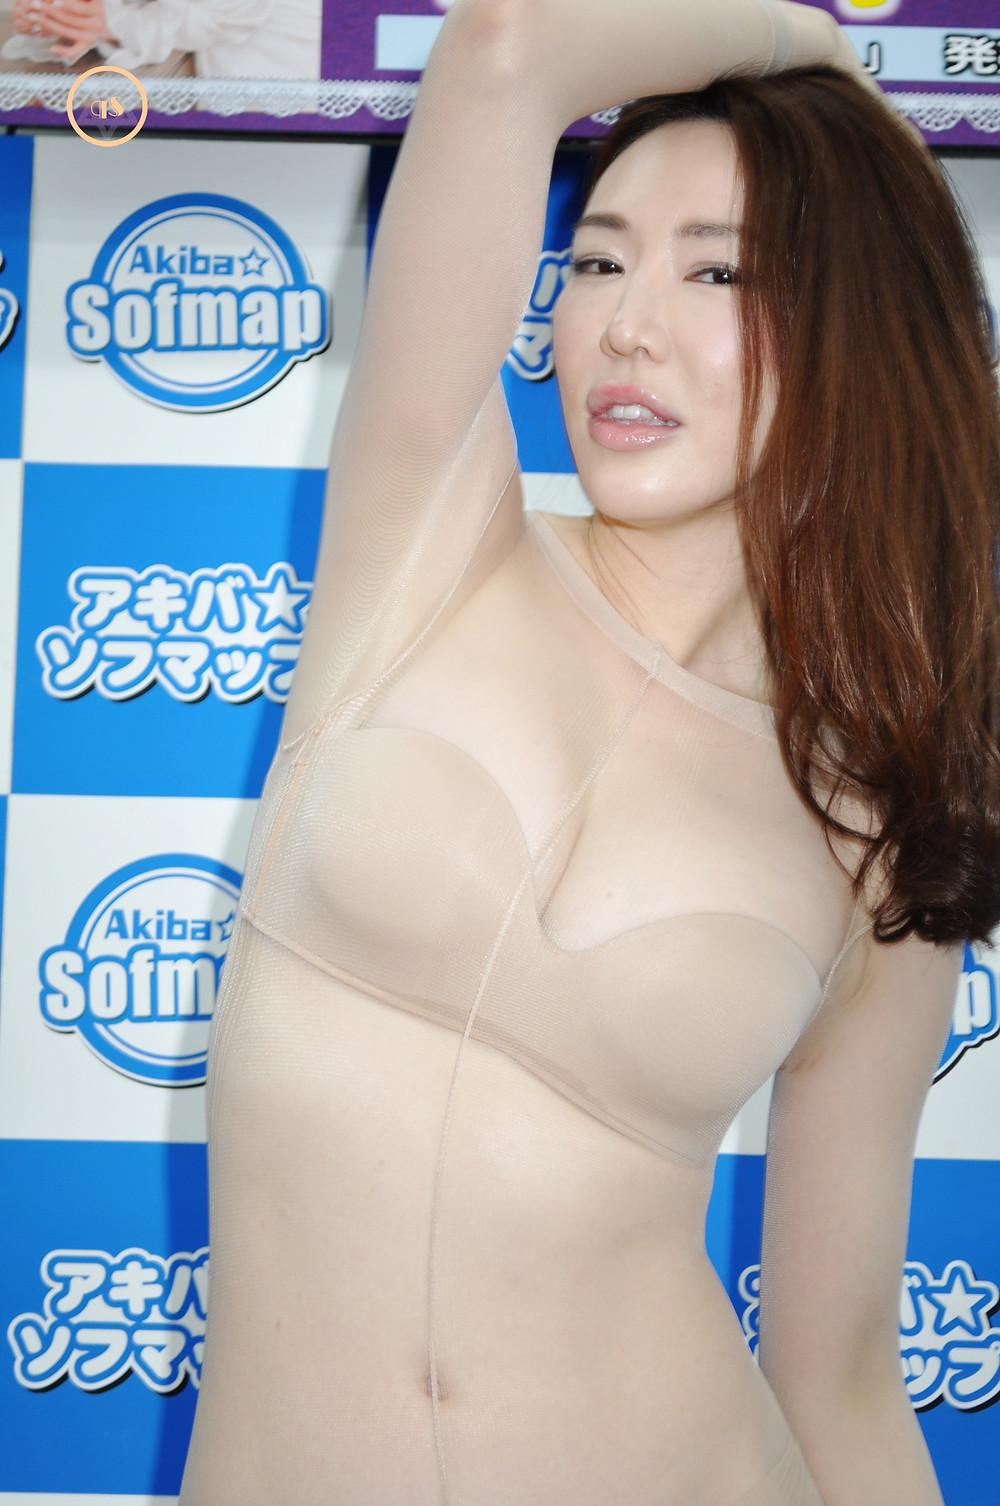 美魔女・美熟女岩本和子『開放区/REAL』DVD・BD発売記念イベント (1)